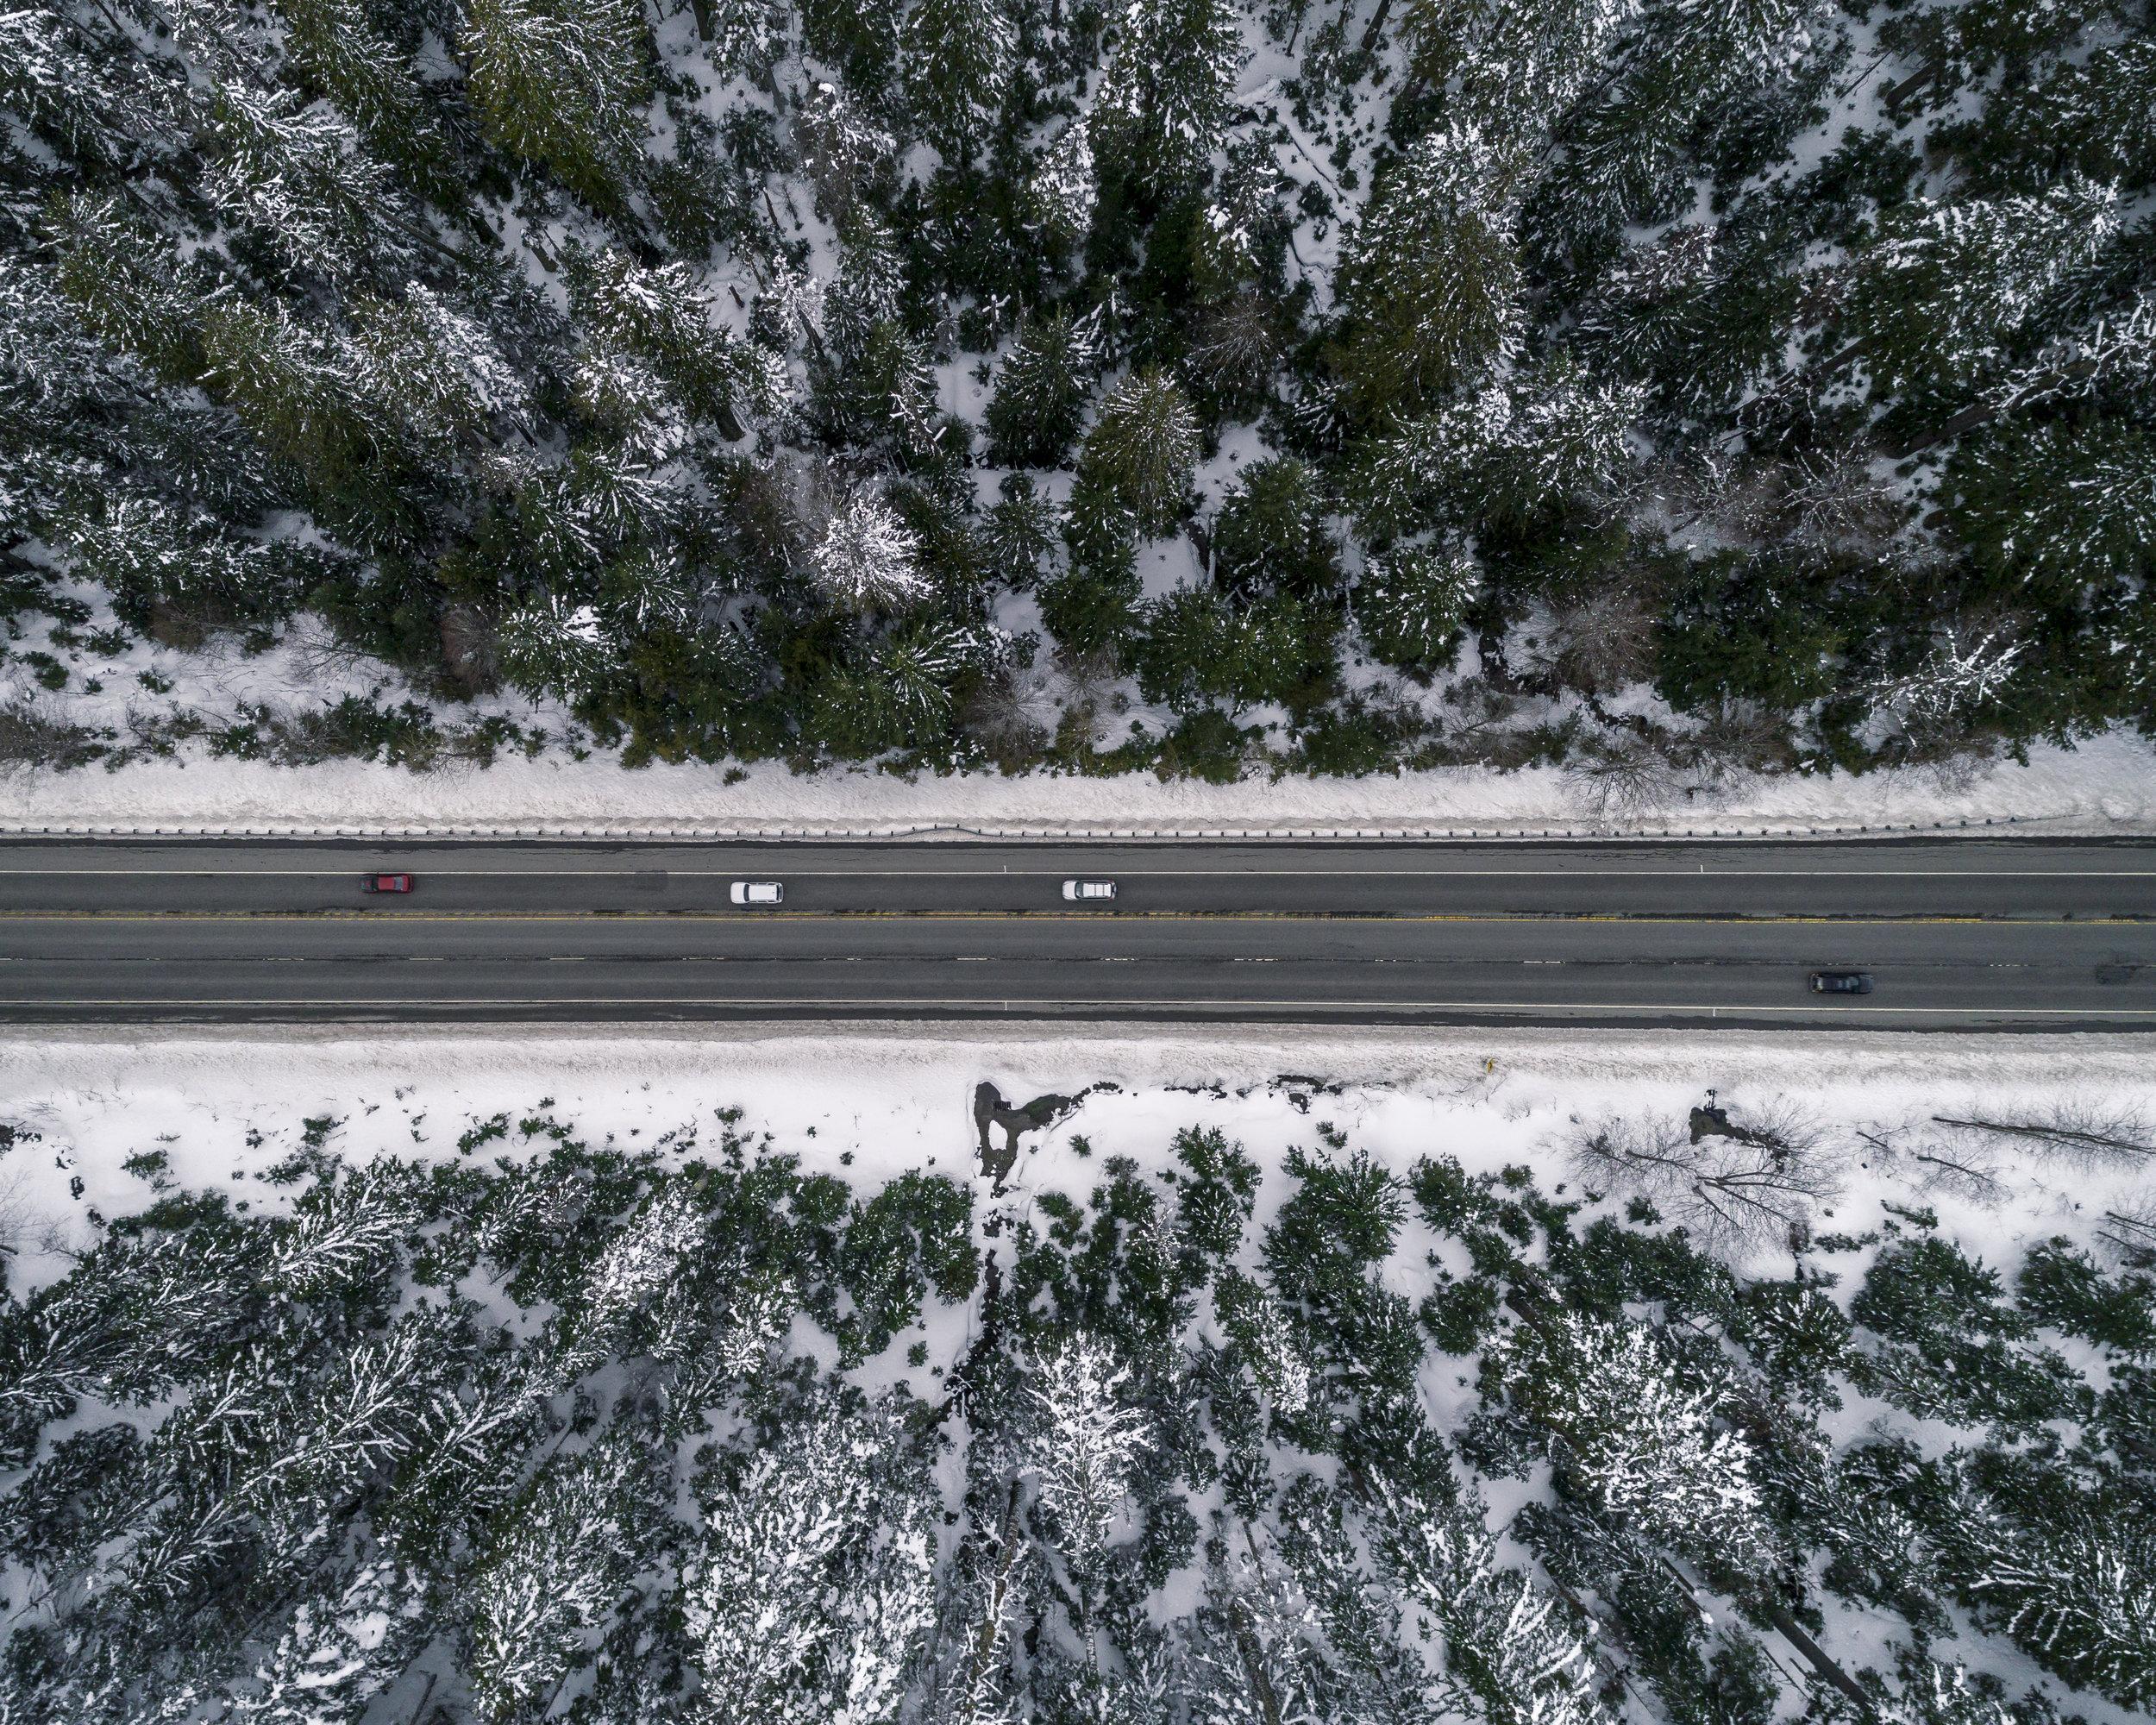 Birdseye_View_Snowy_Forest_Road_Travel_Aerial.jpg